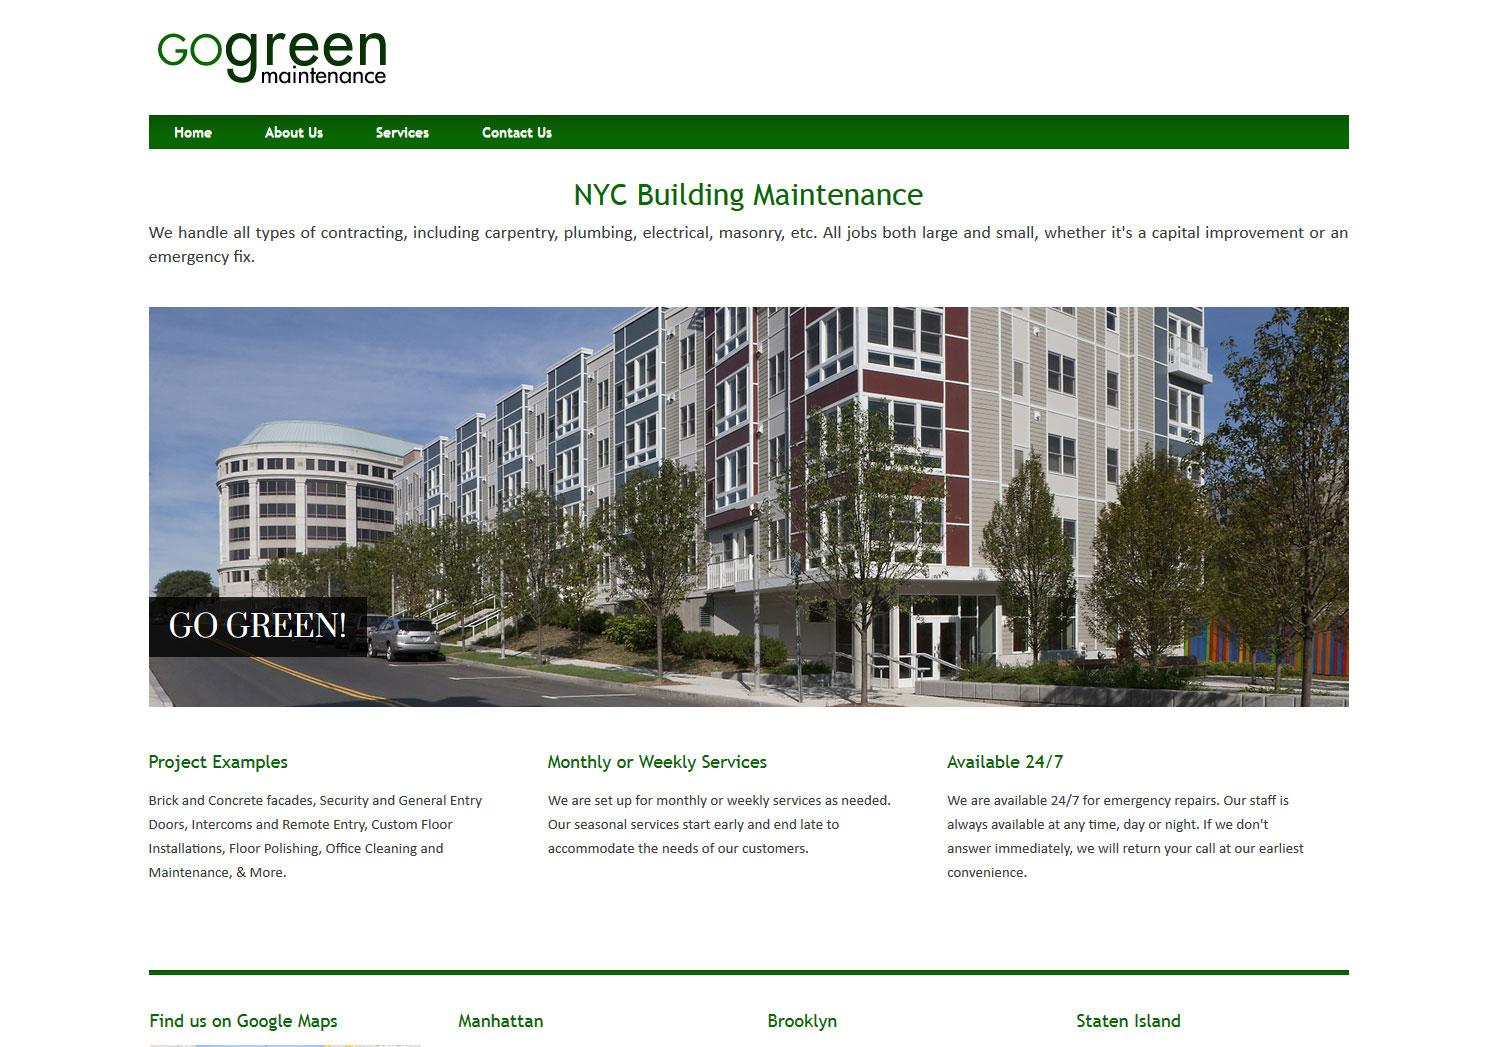 Go Green Maintenance